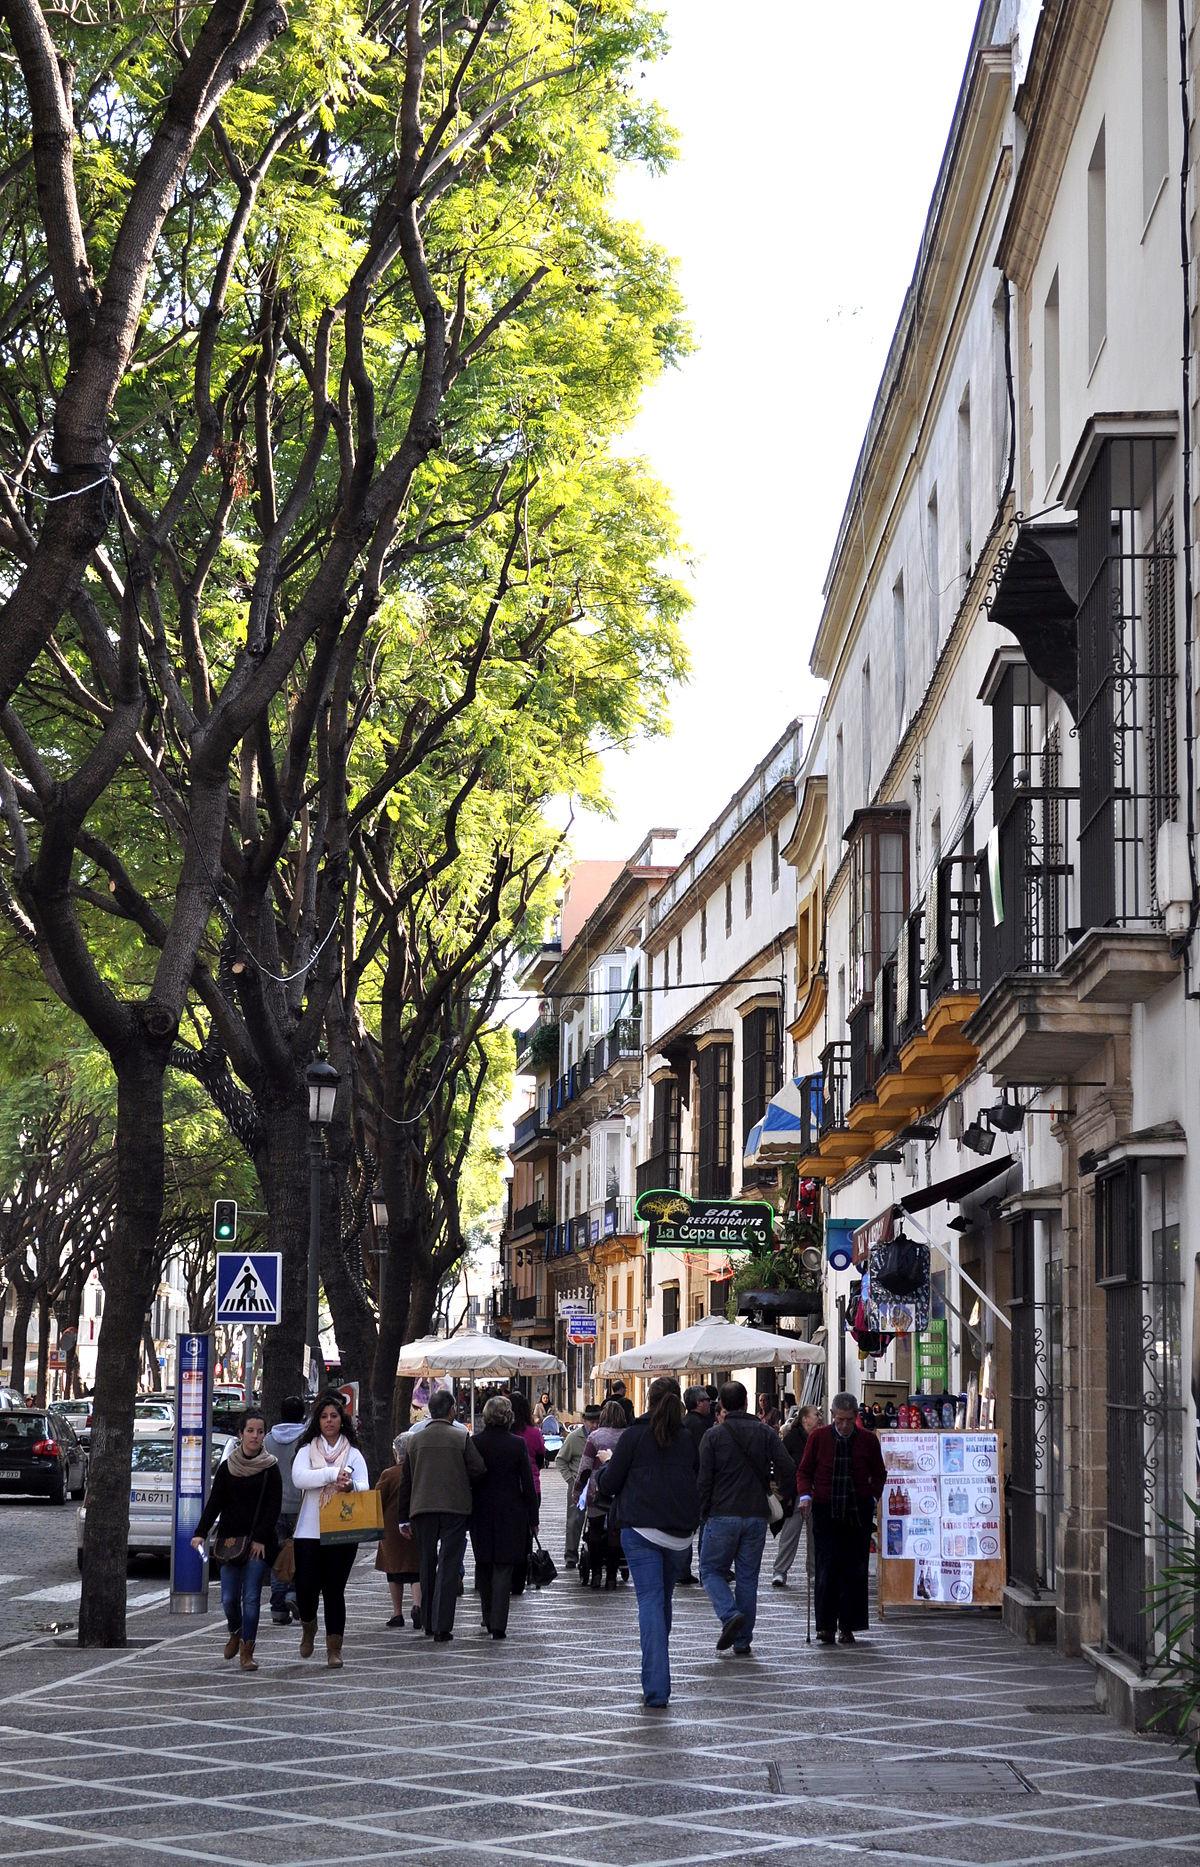 Calle porvera wikipedia la enciclopedia libre for Calle prado jerez 3 navacerrada